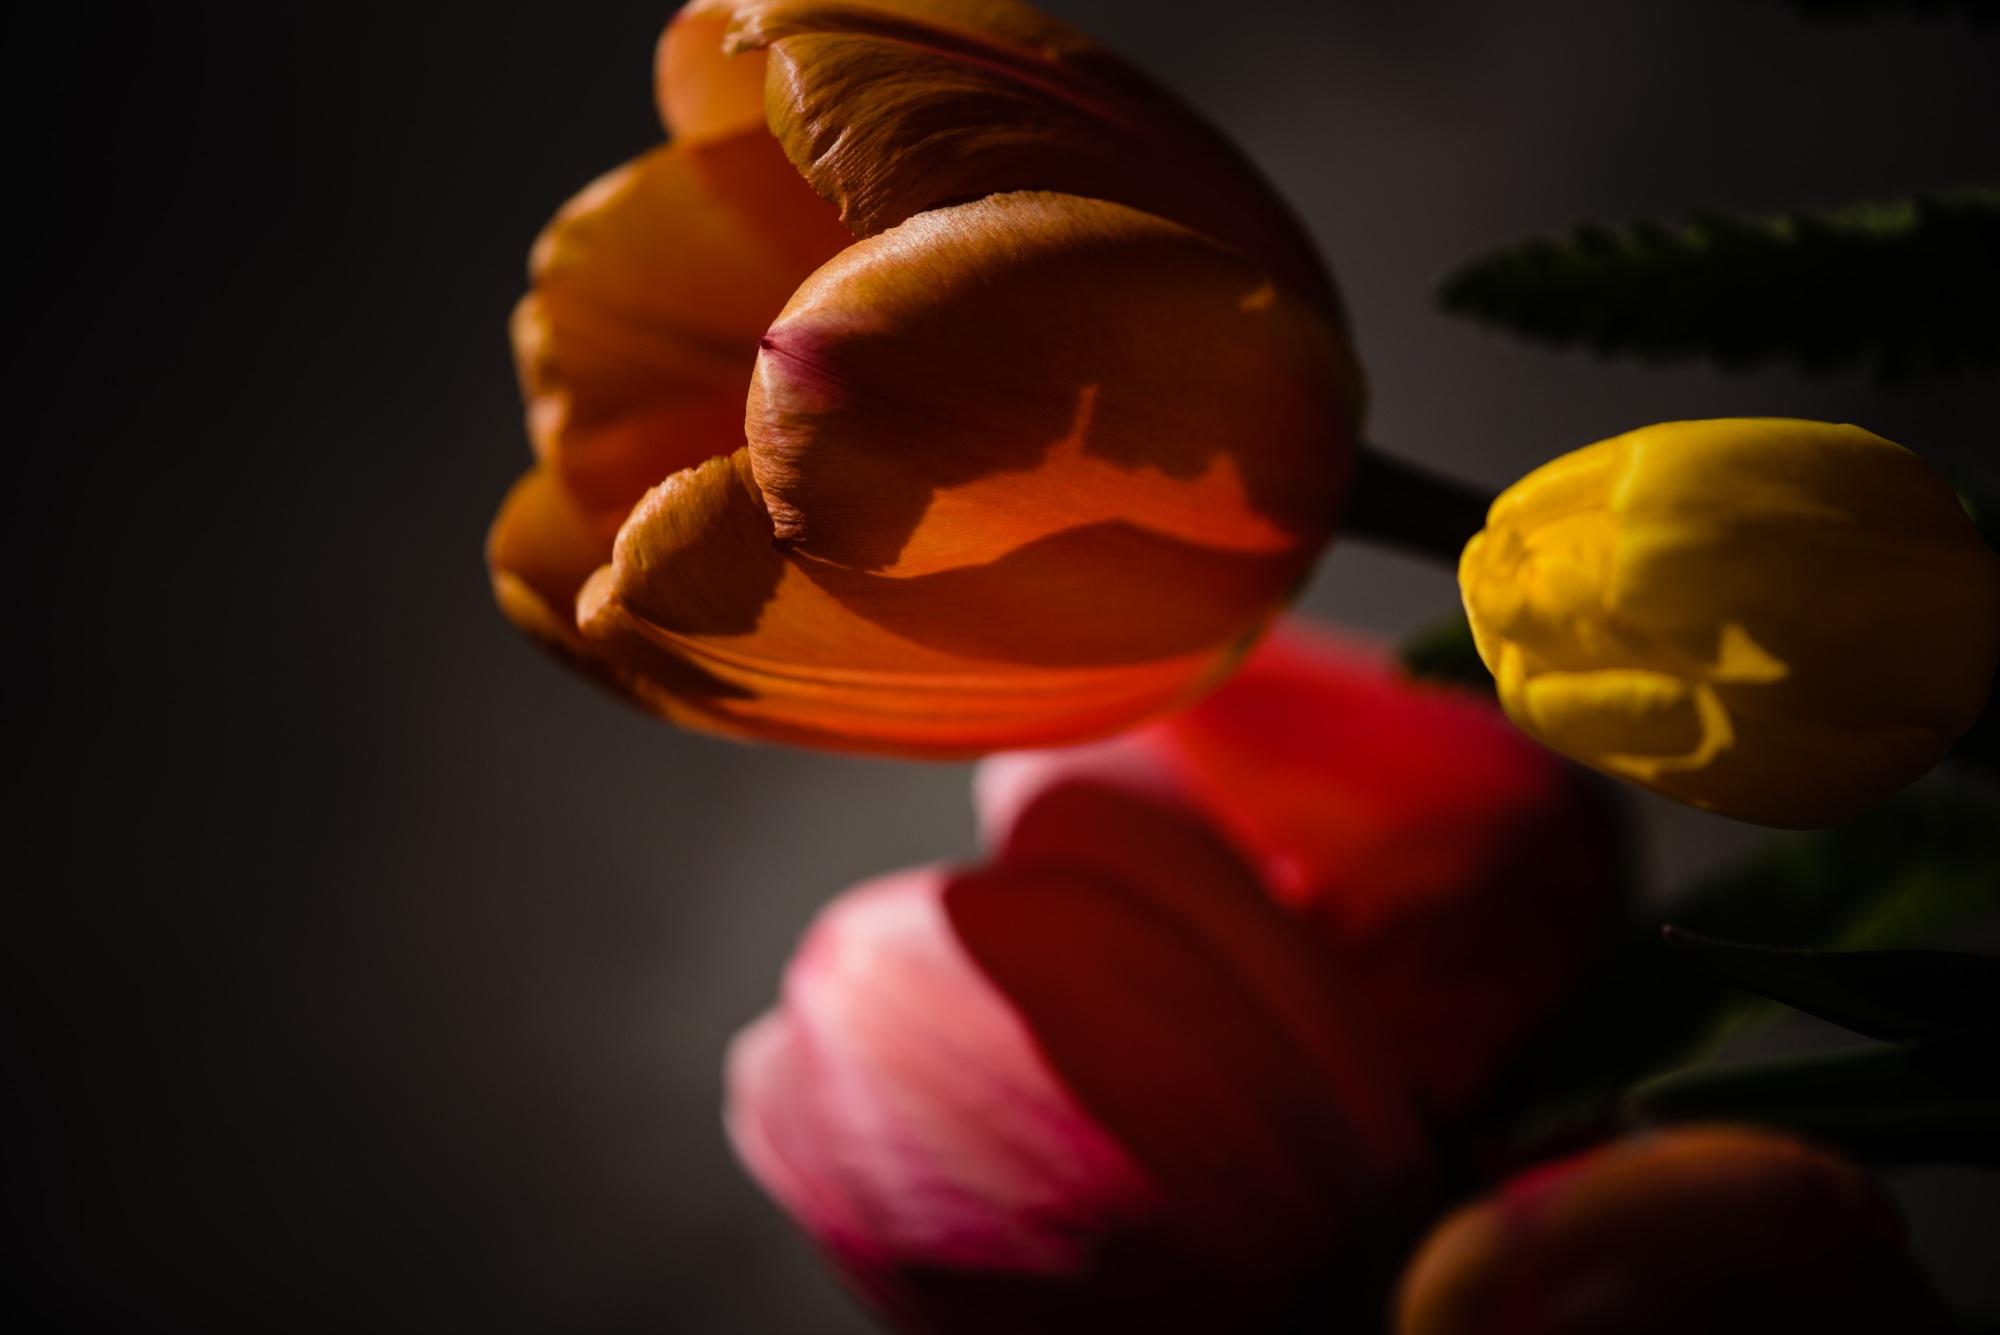 lindseyjanephotography_art011.jpg